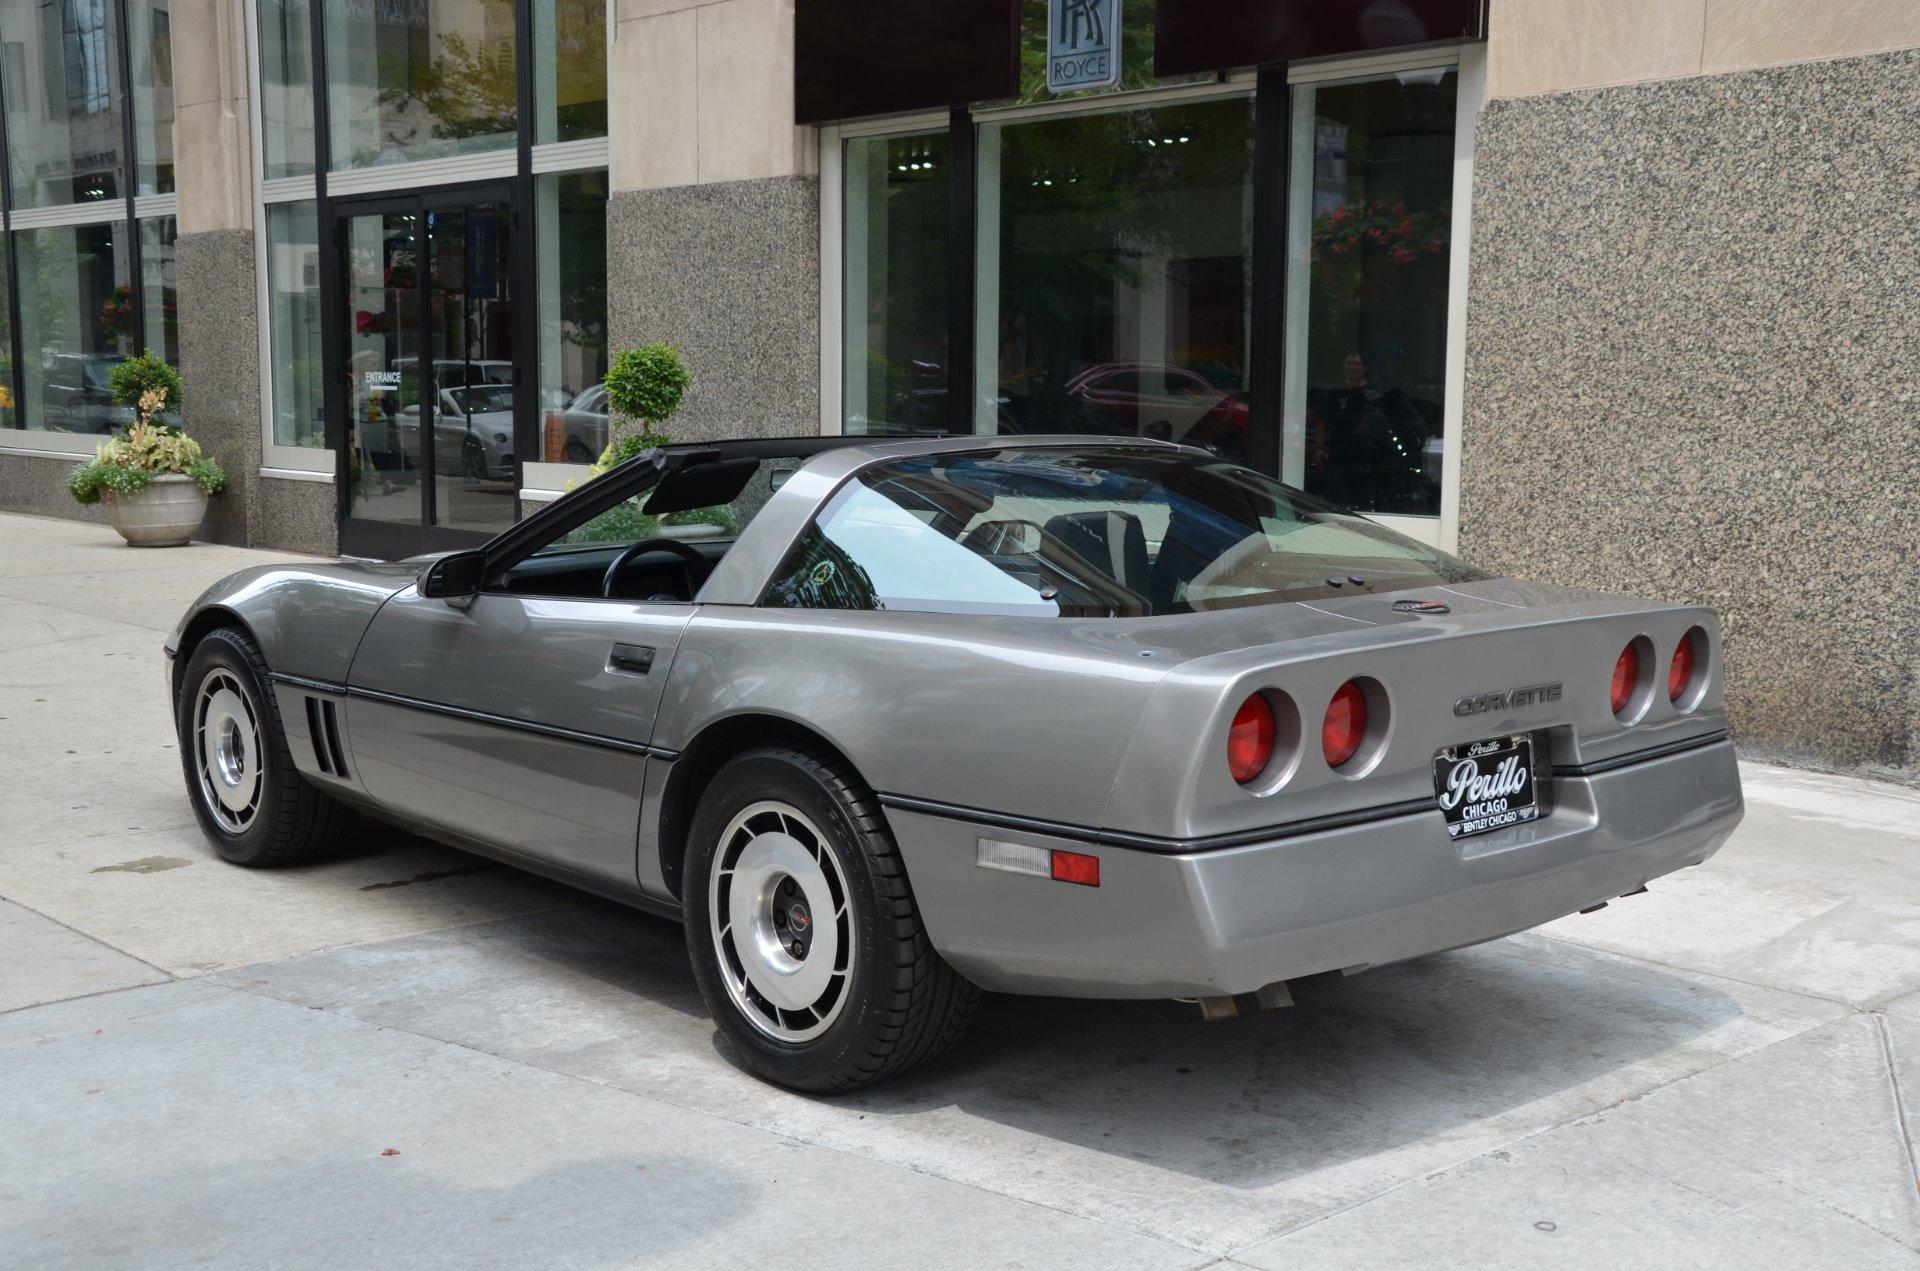 Kelebihan Kekurangan Corvette 1984 Murah Berkualitas